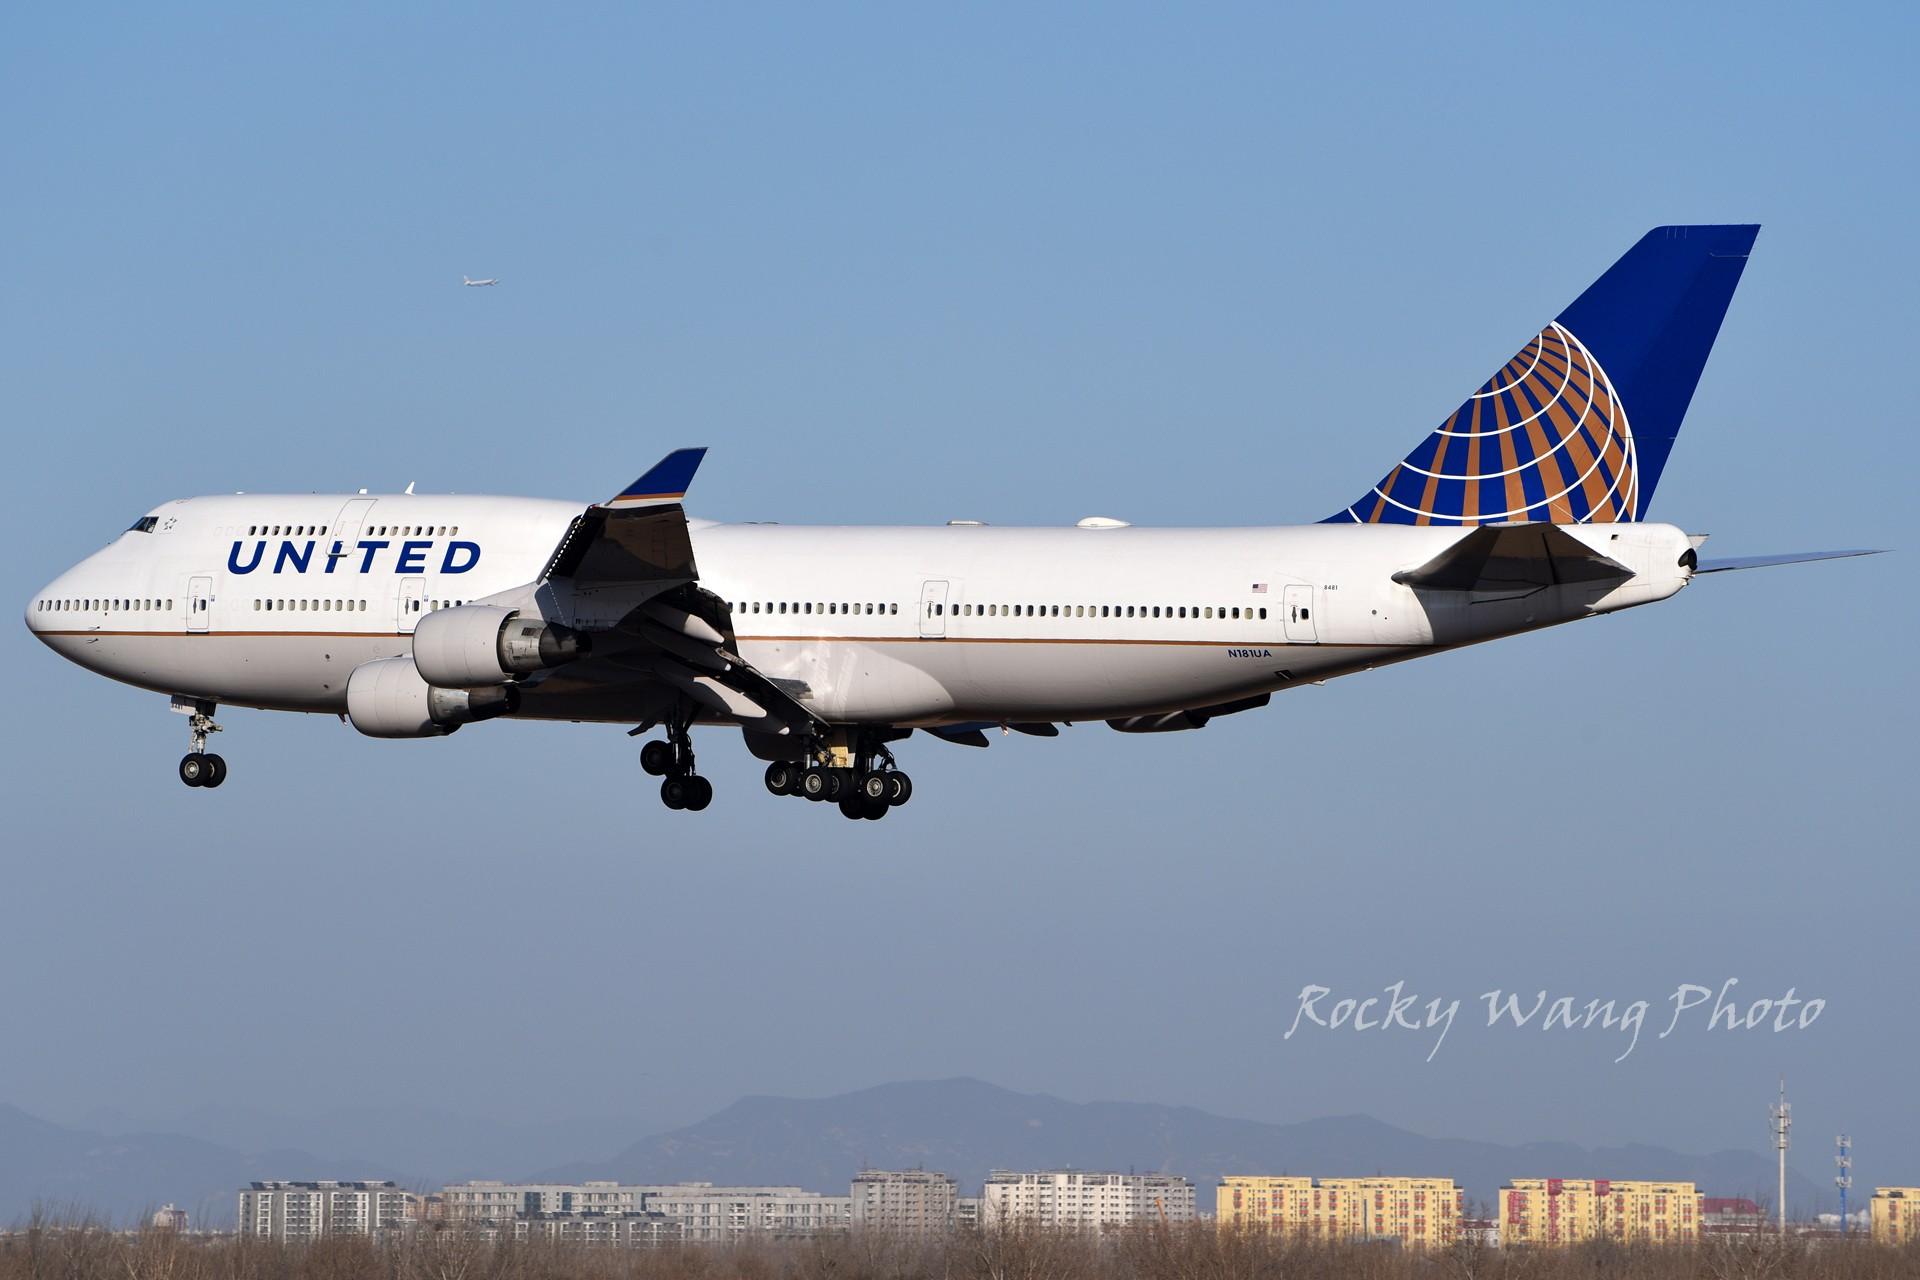 Re:[原创]杂图20张 BOEING 747-400 N181UA 中国北京首都国际机场